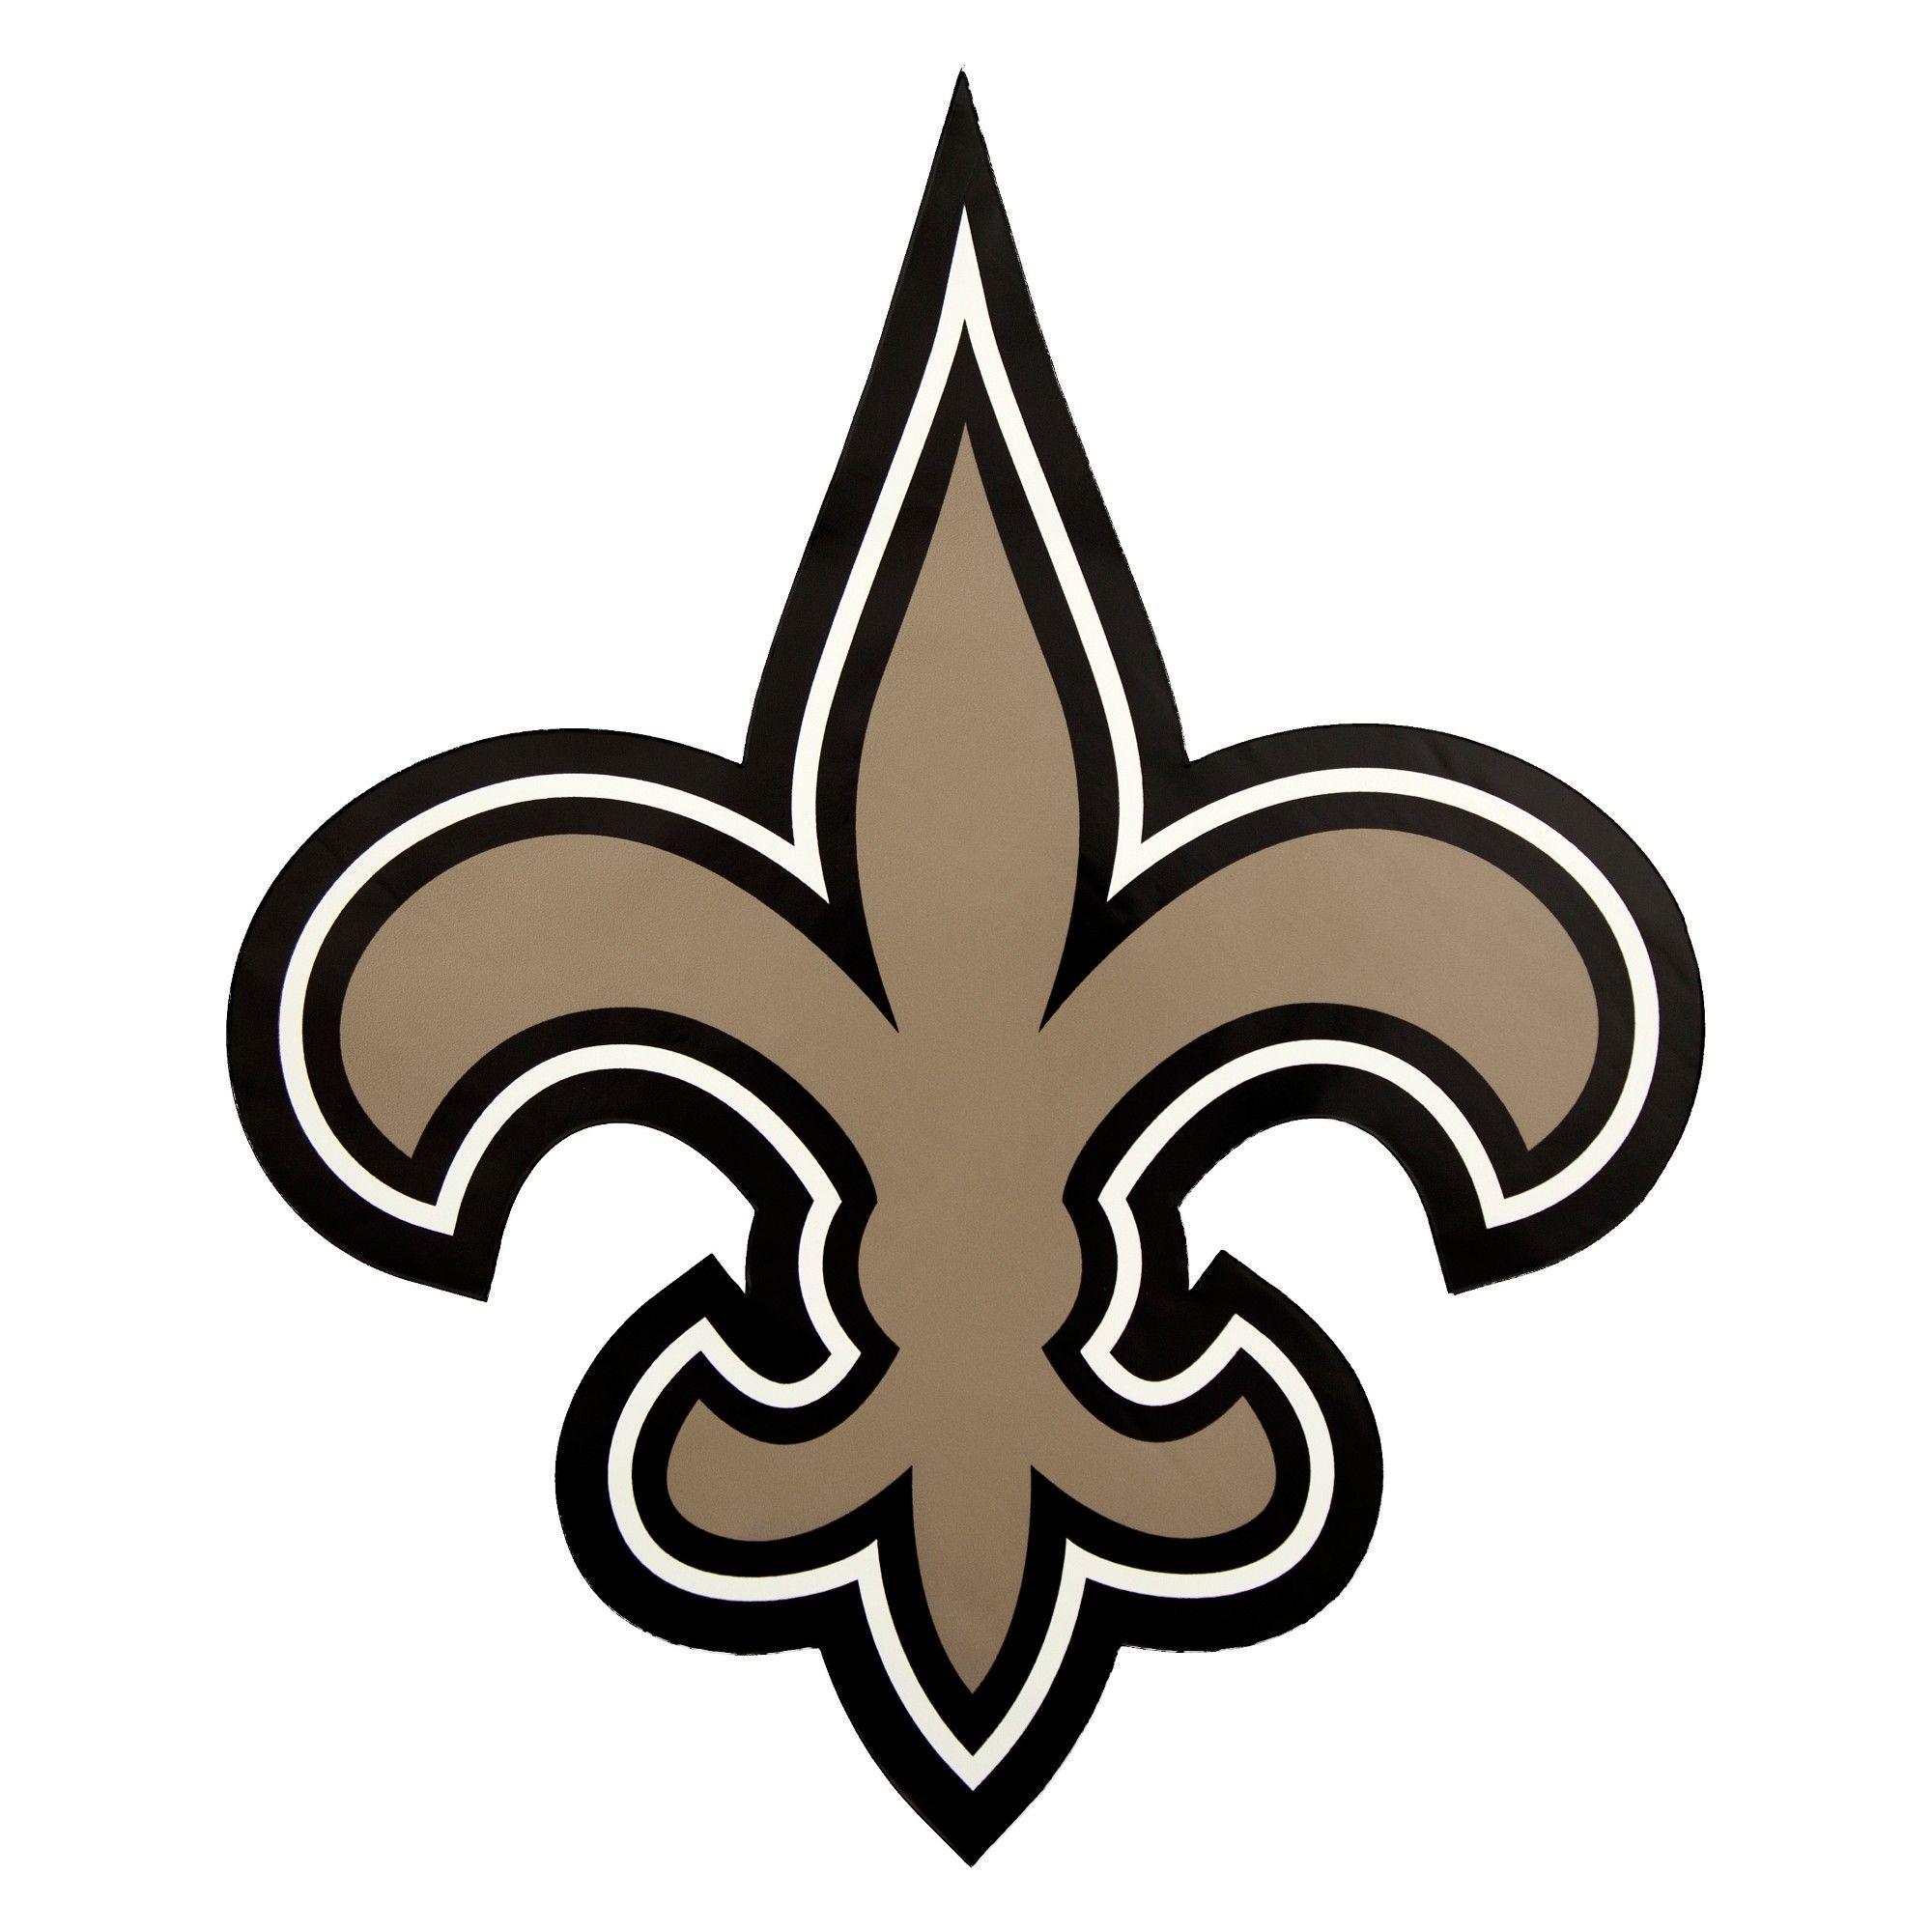 WinCraft New Orleans Saints 8 Football Vinyl Decal Car Truck Stickers NFL